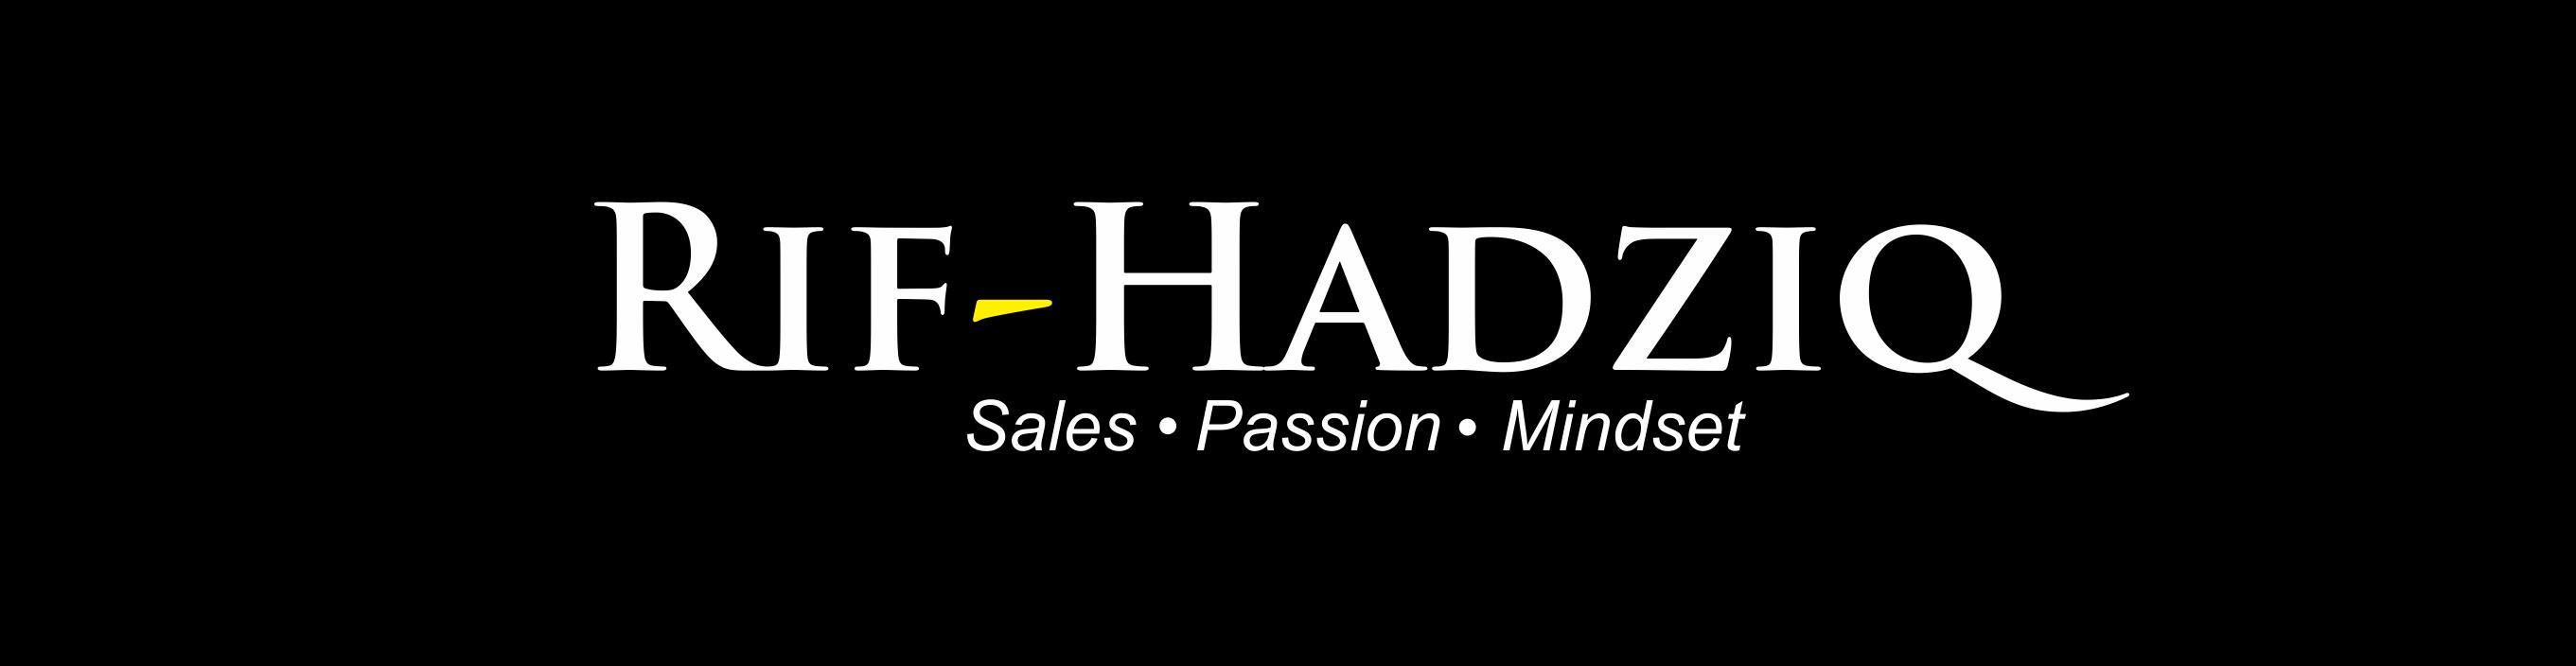 motivator indonesia, motivator perusahaan, rif hadziq, training motivasi